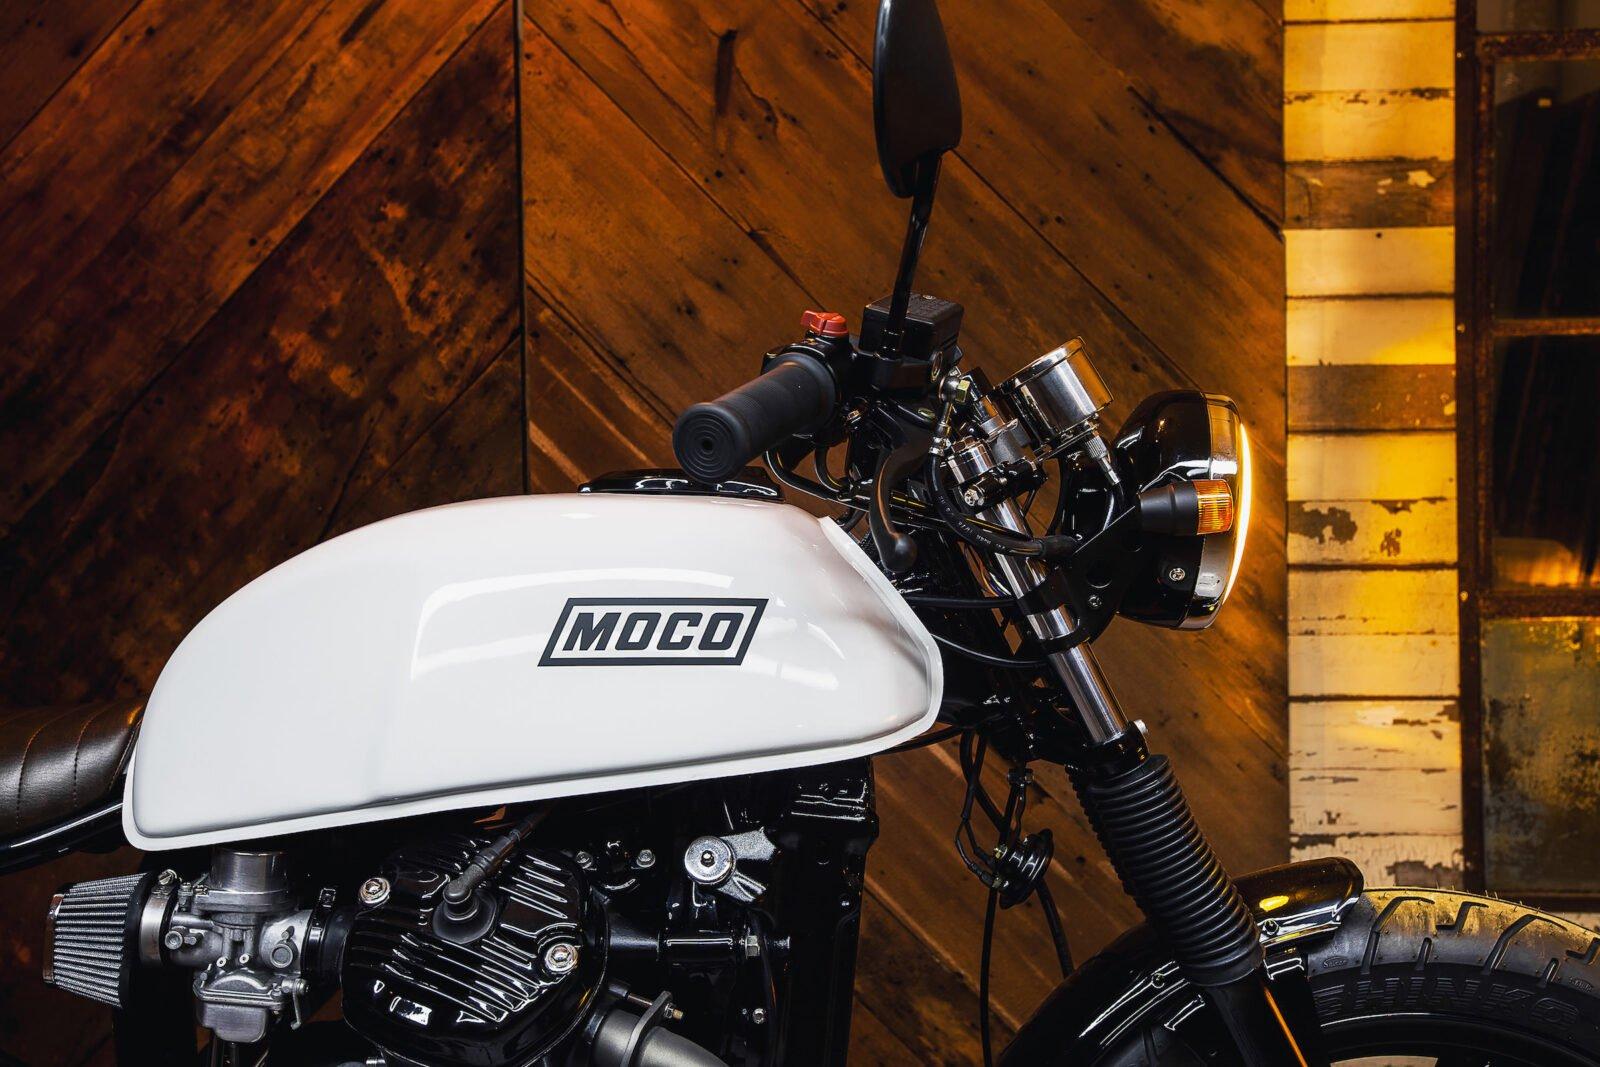 Midnight Oil Cycle Co. Honda CX500 16 1600x1067 - Midnight Oil Cycle Co. Honda CX500